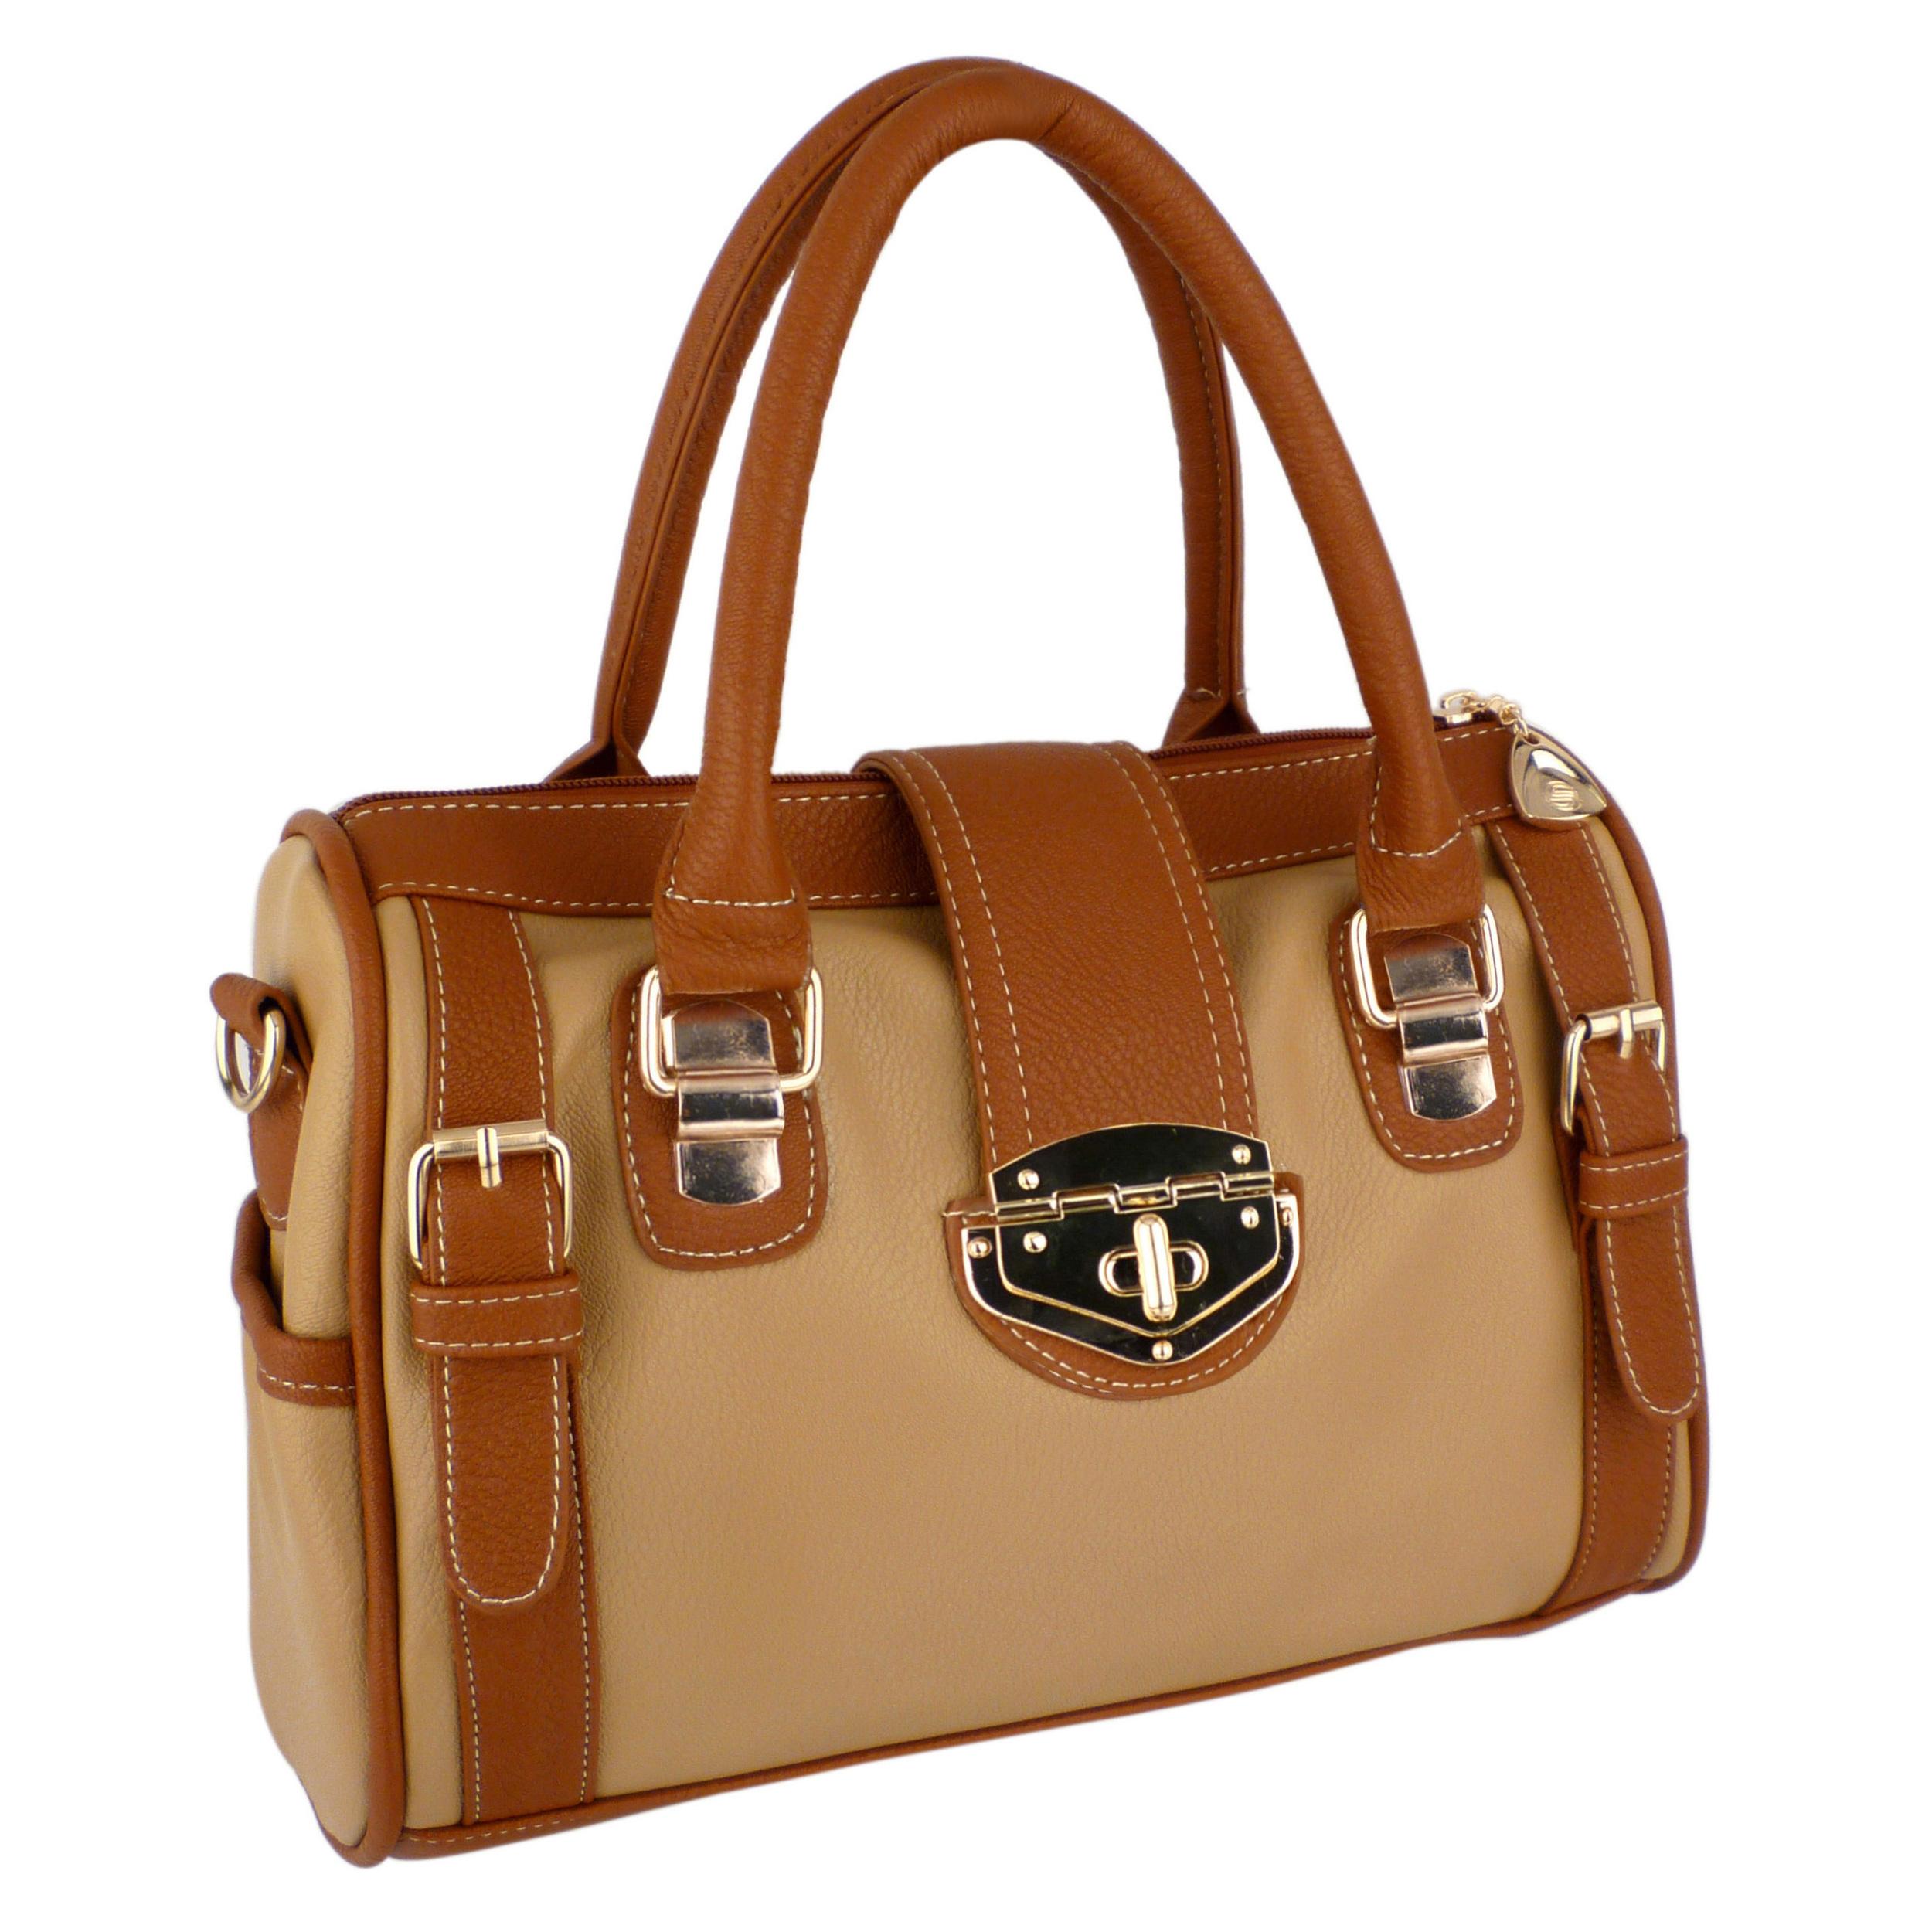 BRADLEY Brown Dual-tone Bowler Style Handbag Main